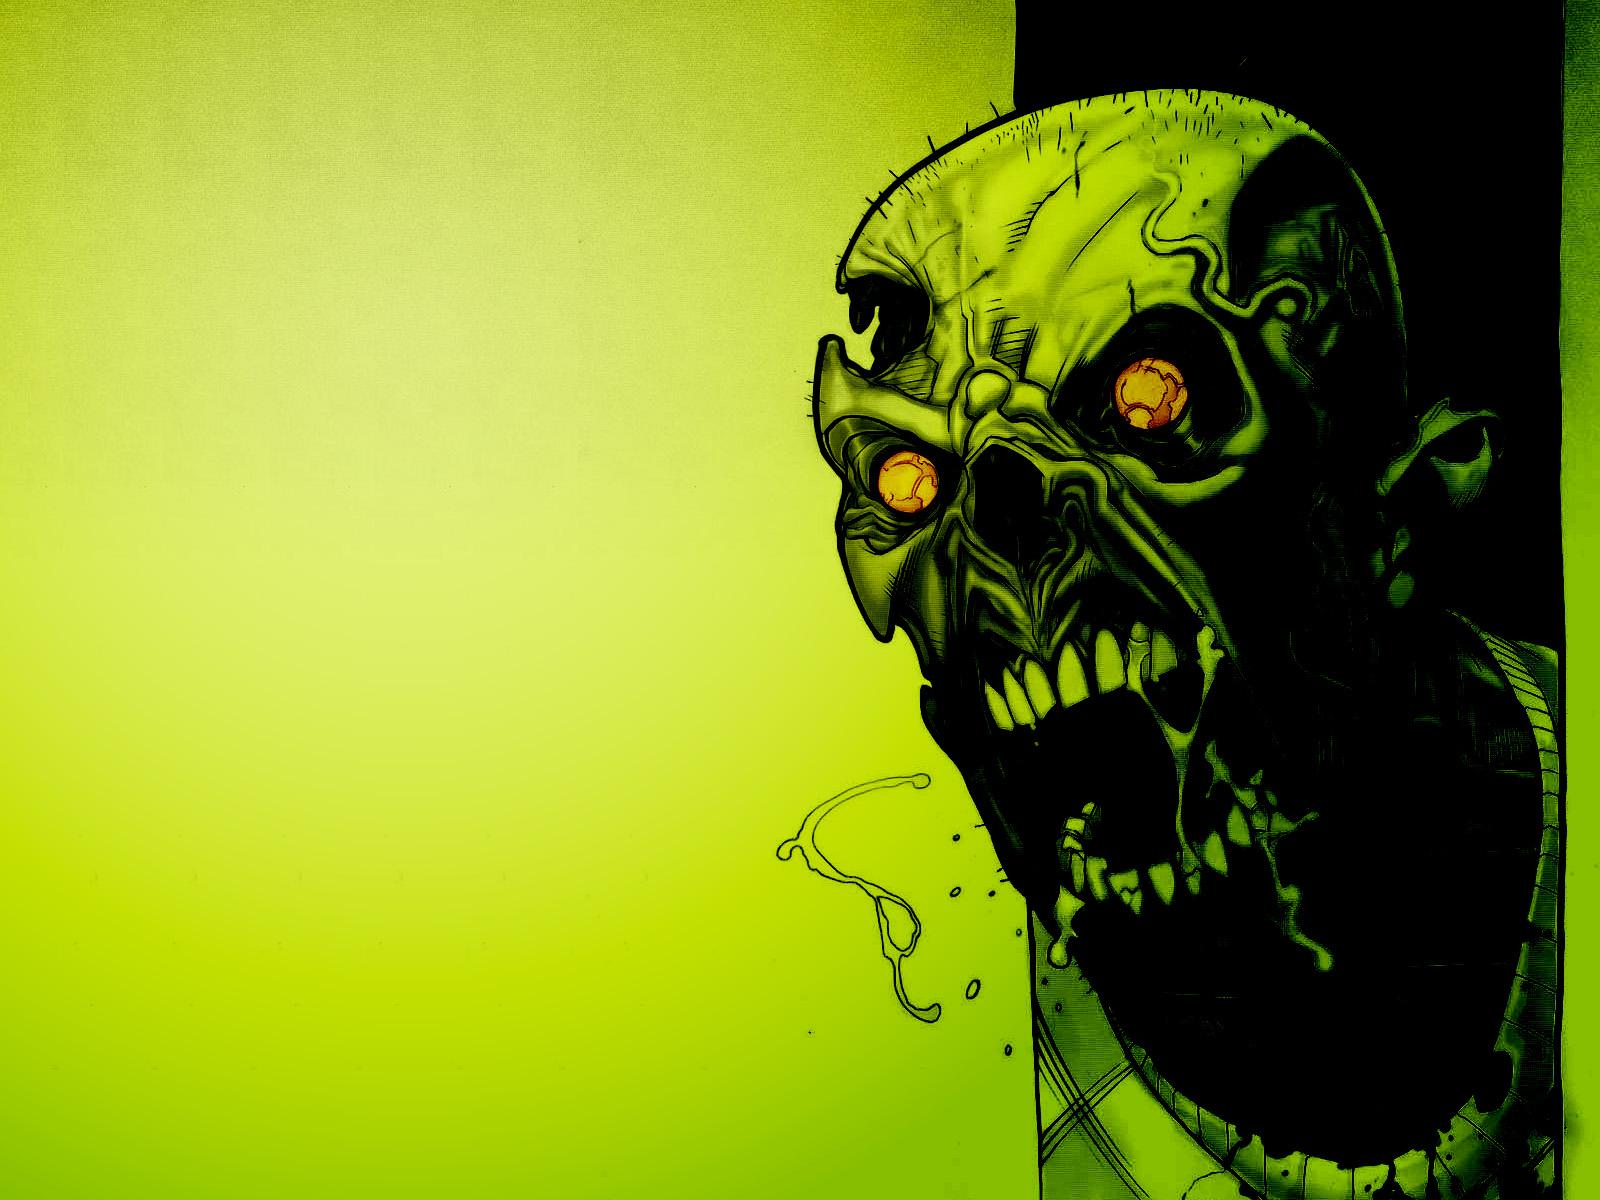 Fantastic   Wallpaper Home Screen Skull - skull%252Bwallpapers%252Bfor%252Bdesktop-3  You Should Have_742989.jpg